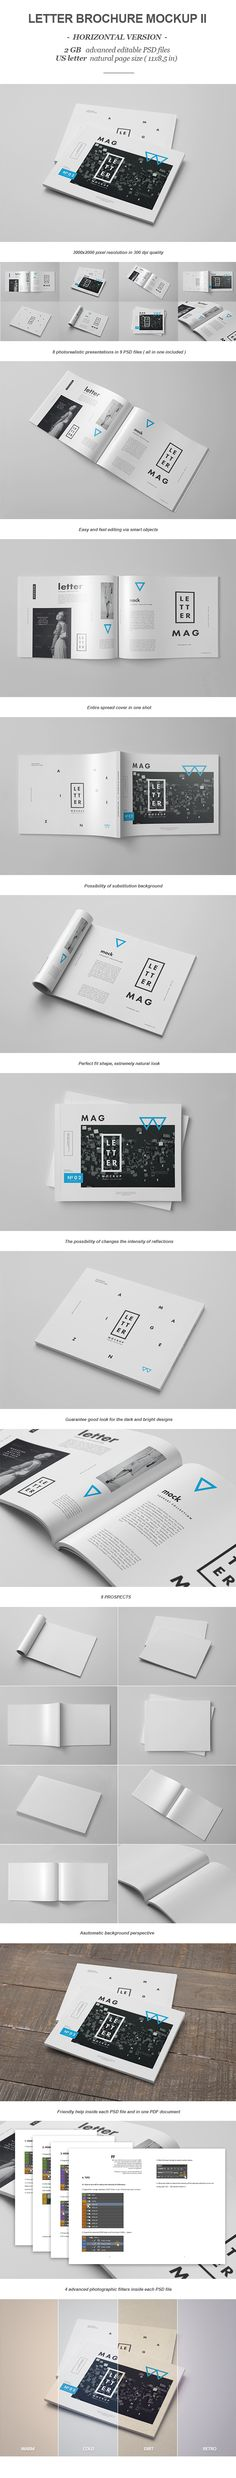 Horizontal Letter Magazine / Brochure Mock-up 2 on Behance